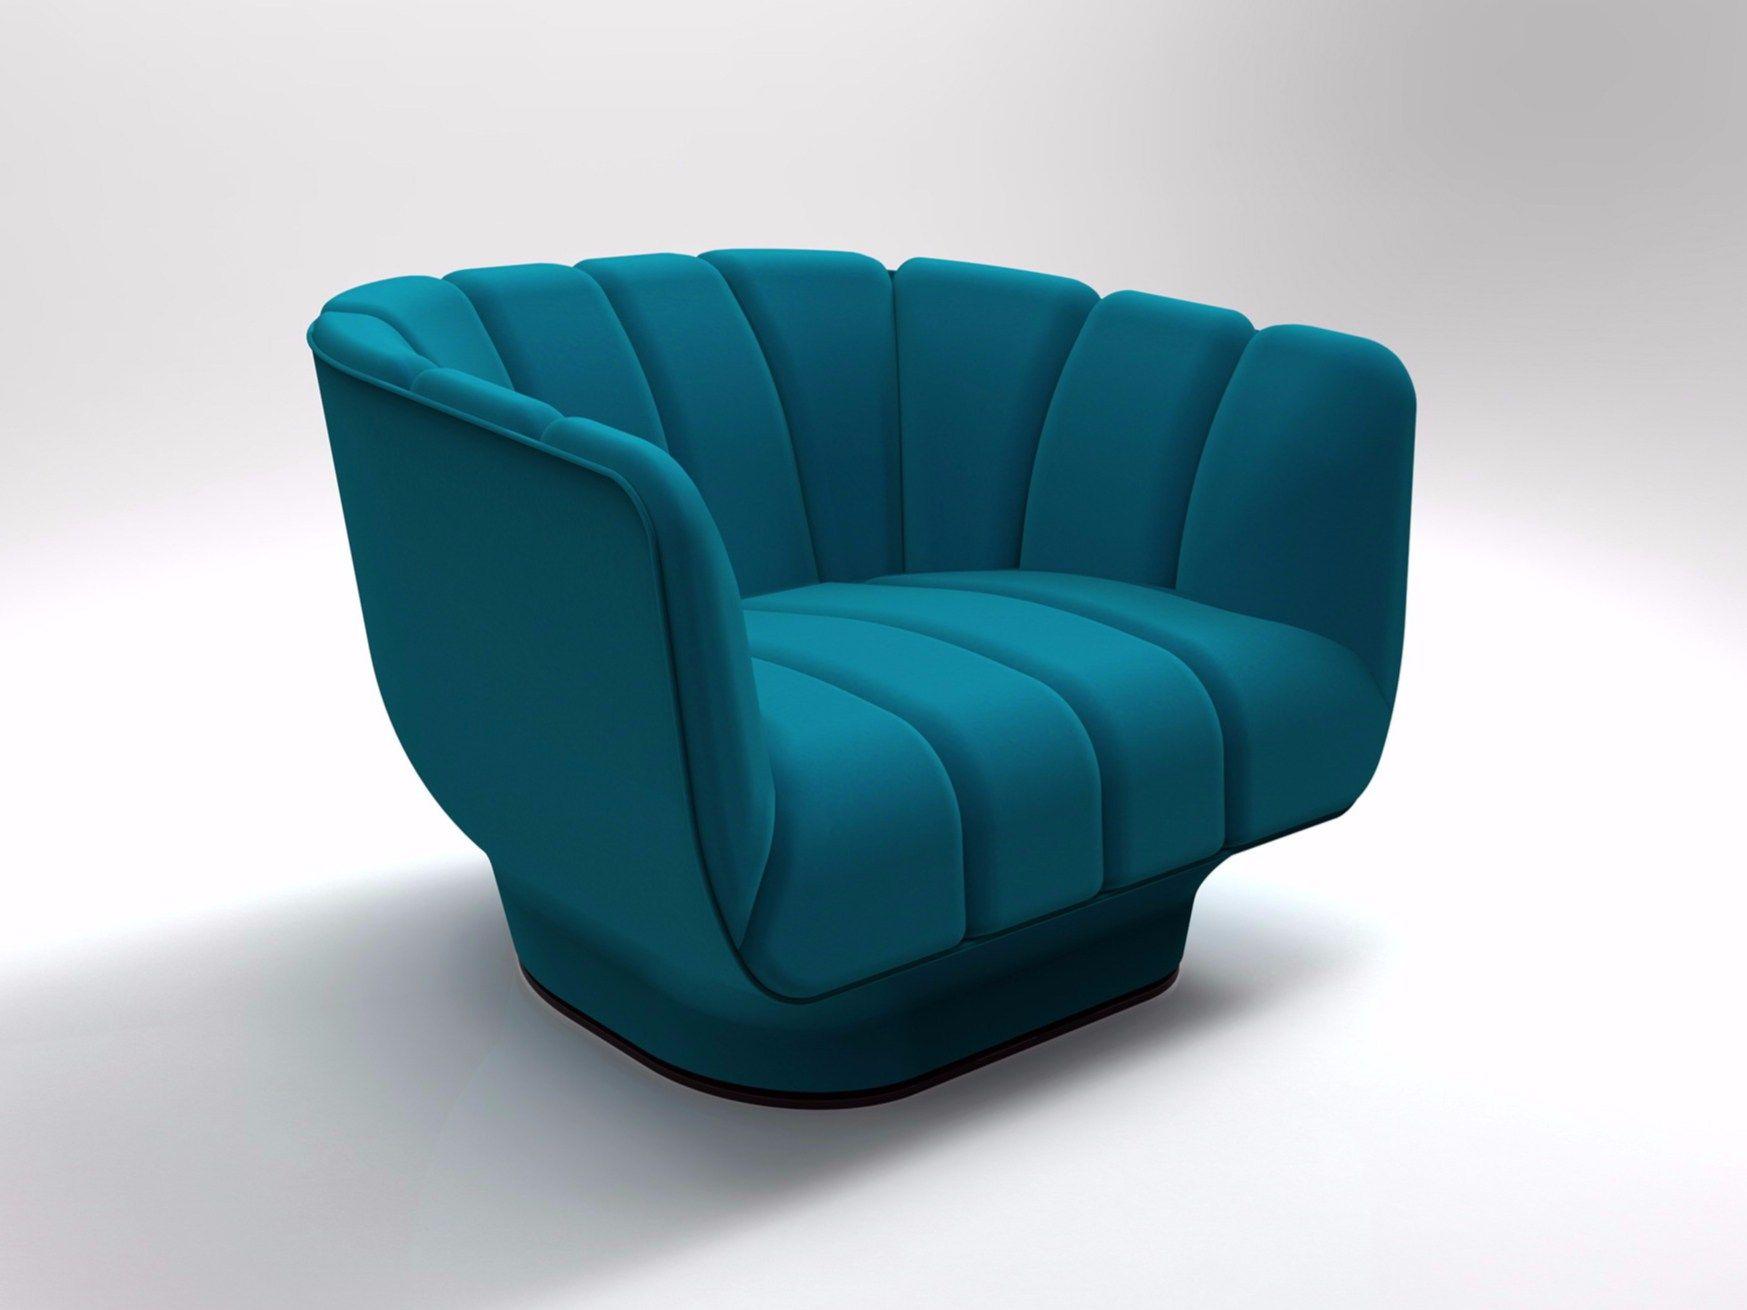 odea armchair by roche bobois design roberto tapinassi. Black Bedroom Furniture Sets. Home Design Ideas